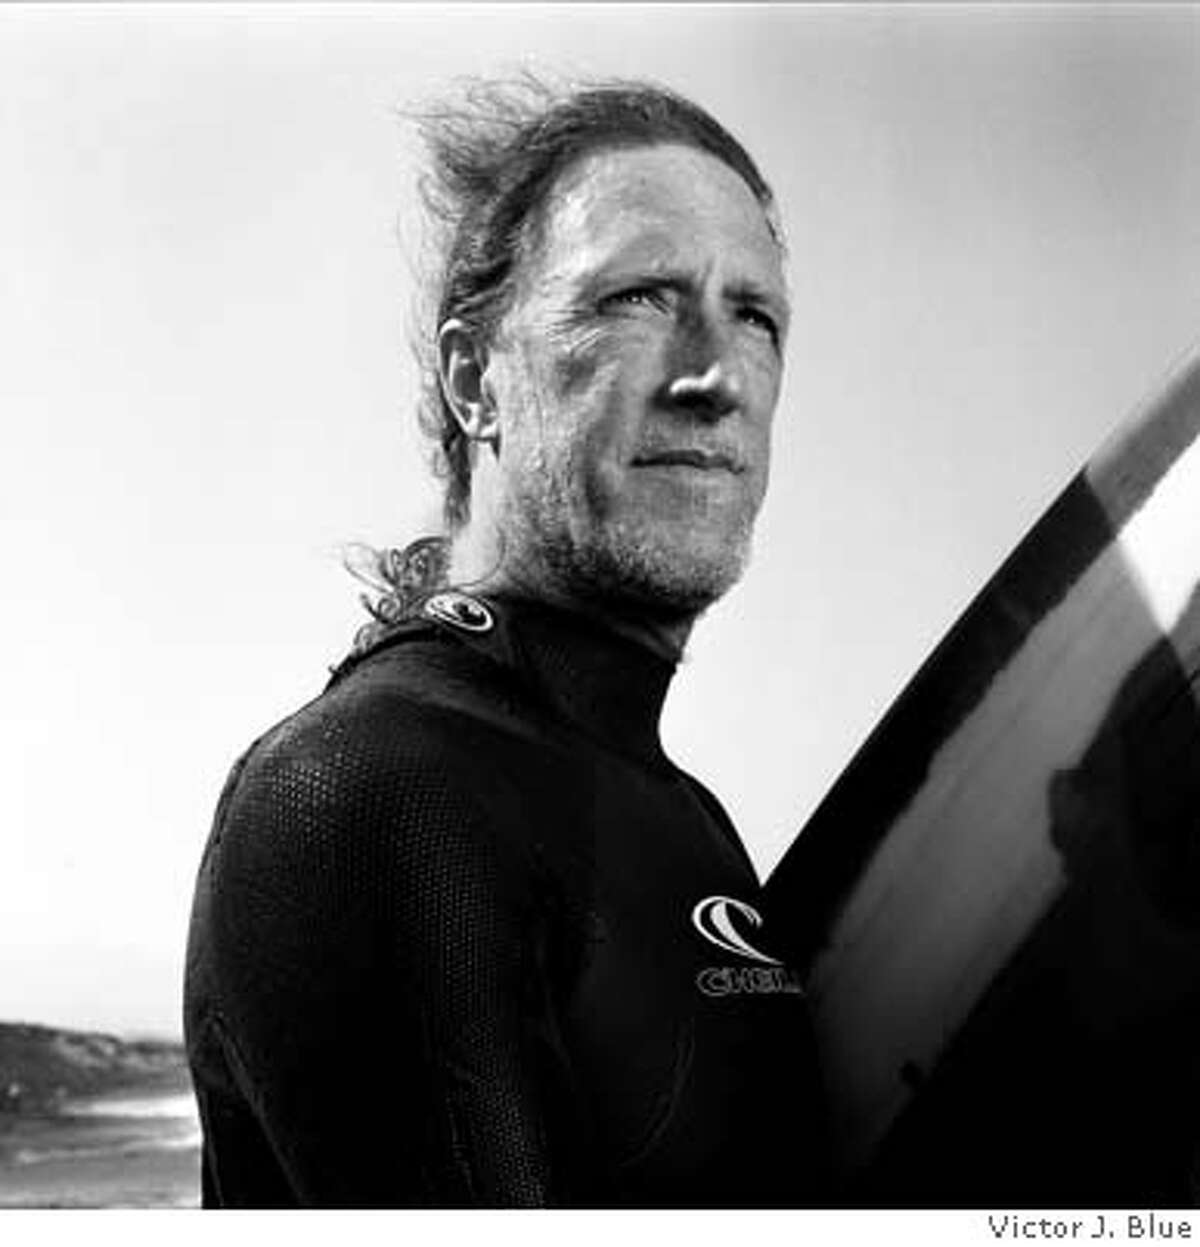 Surfer Mark Renneker at Ocean Beach in San Francisco. Photo by Victor J. Blue